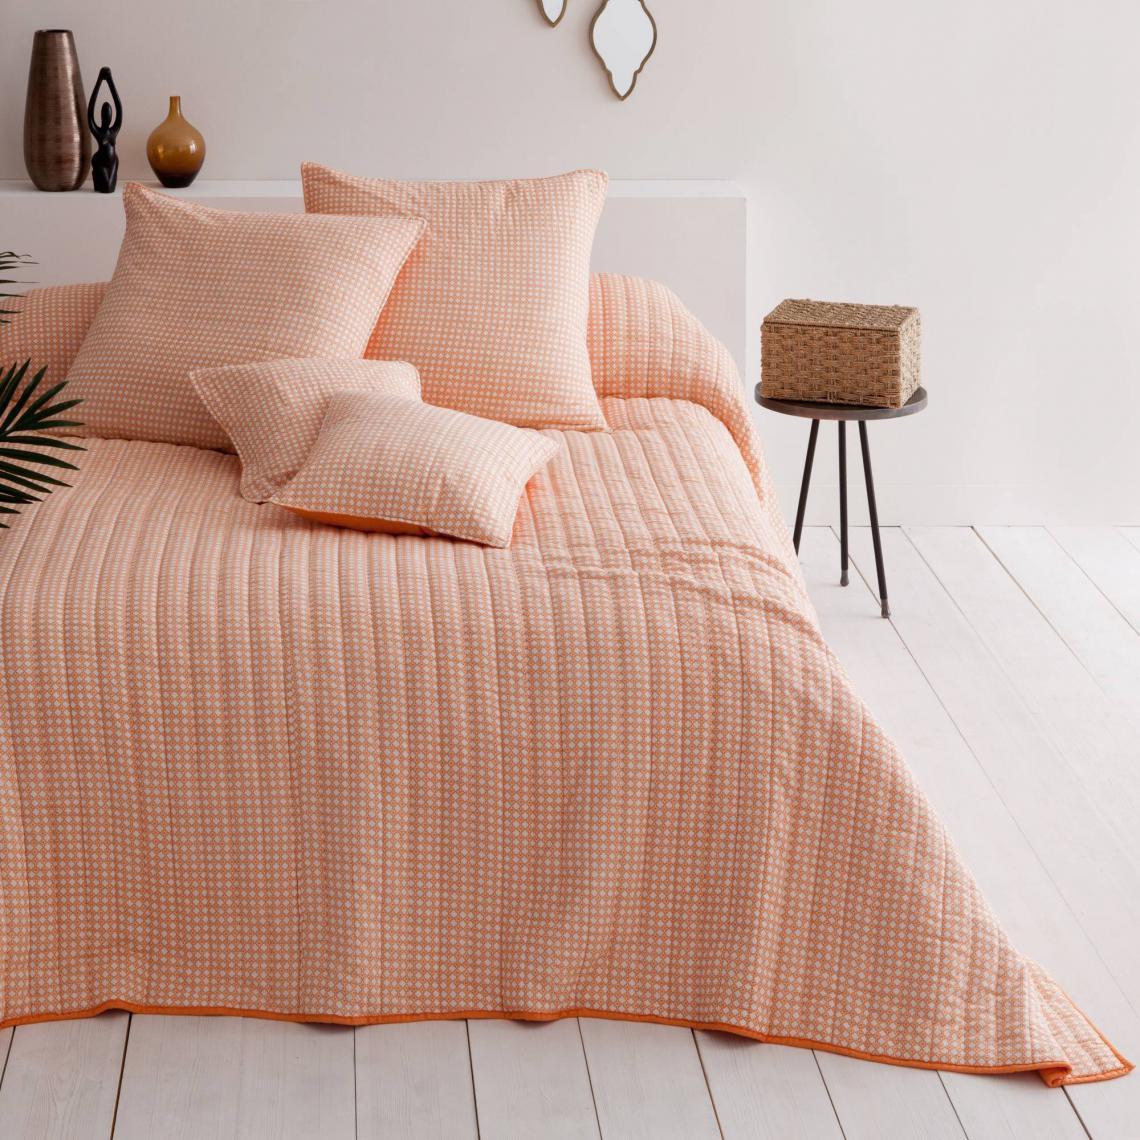 Plaid ou couvre lit boutis coton Goa abricot Harmony   Orange | 3